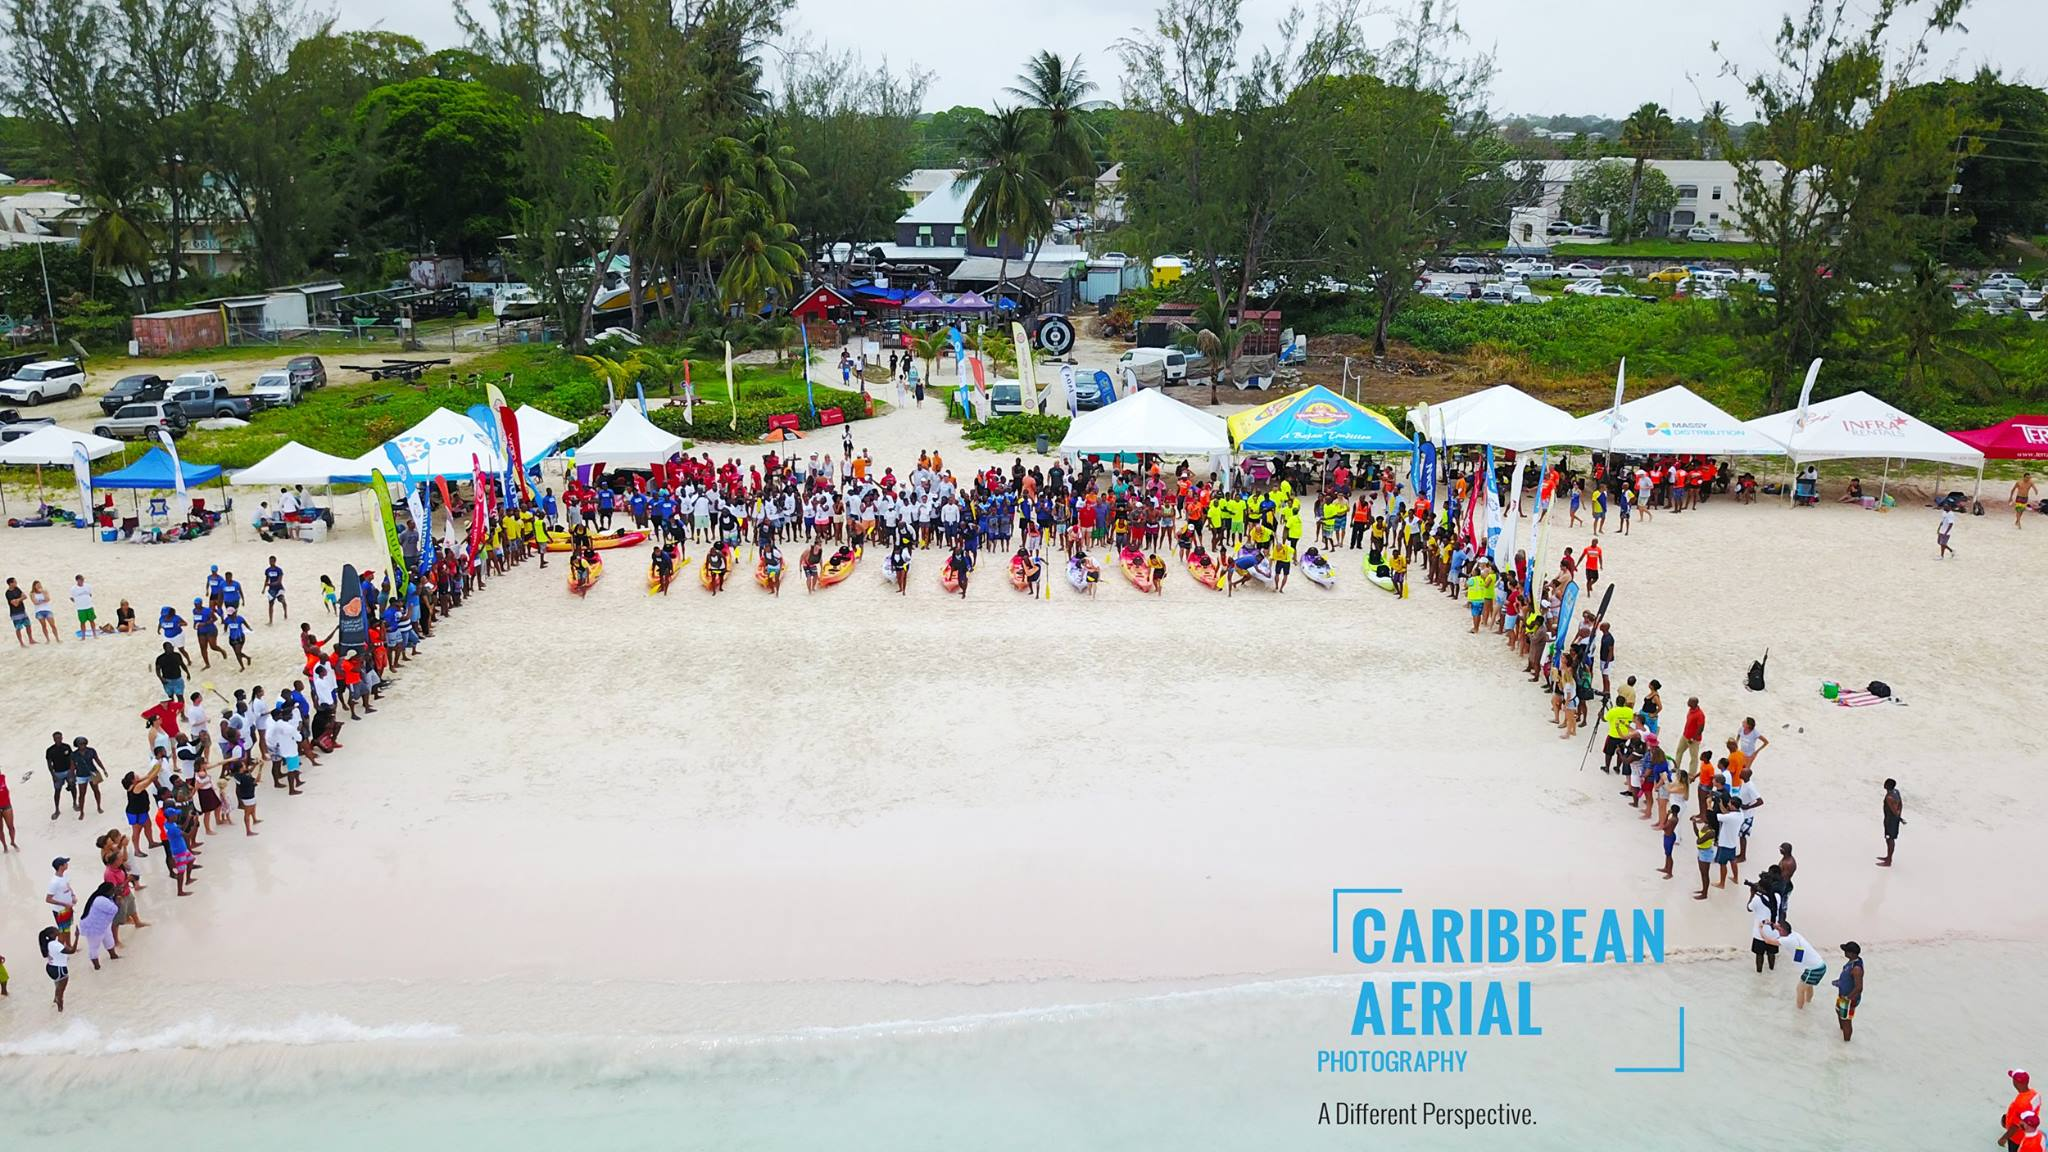 caribbean-aerial-photography-007